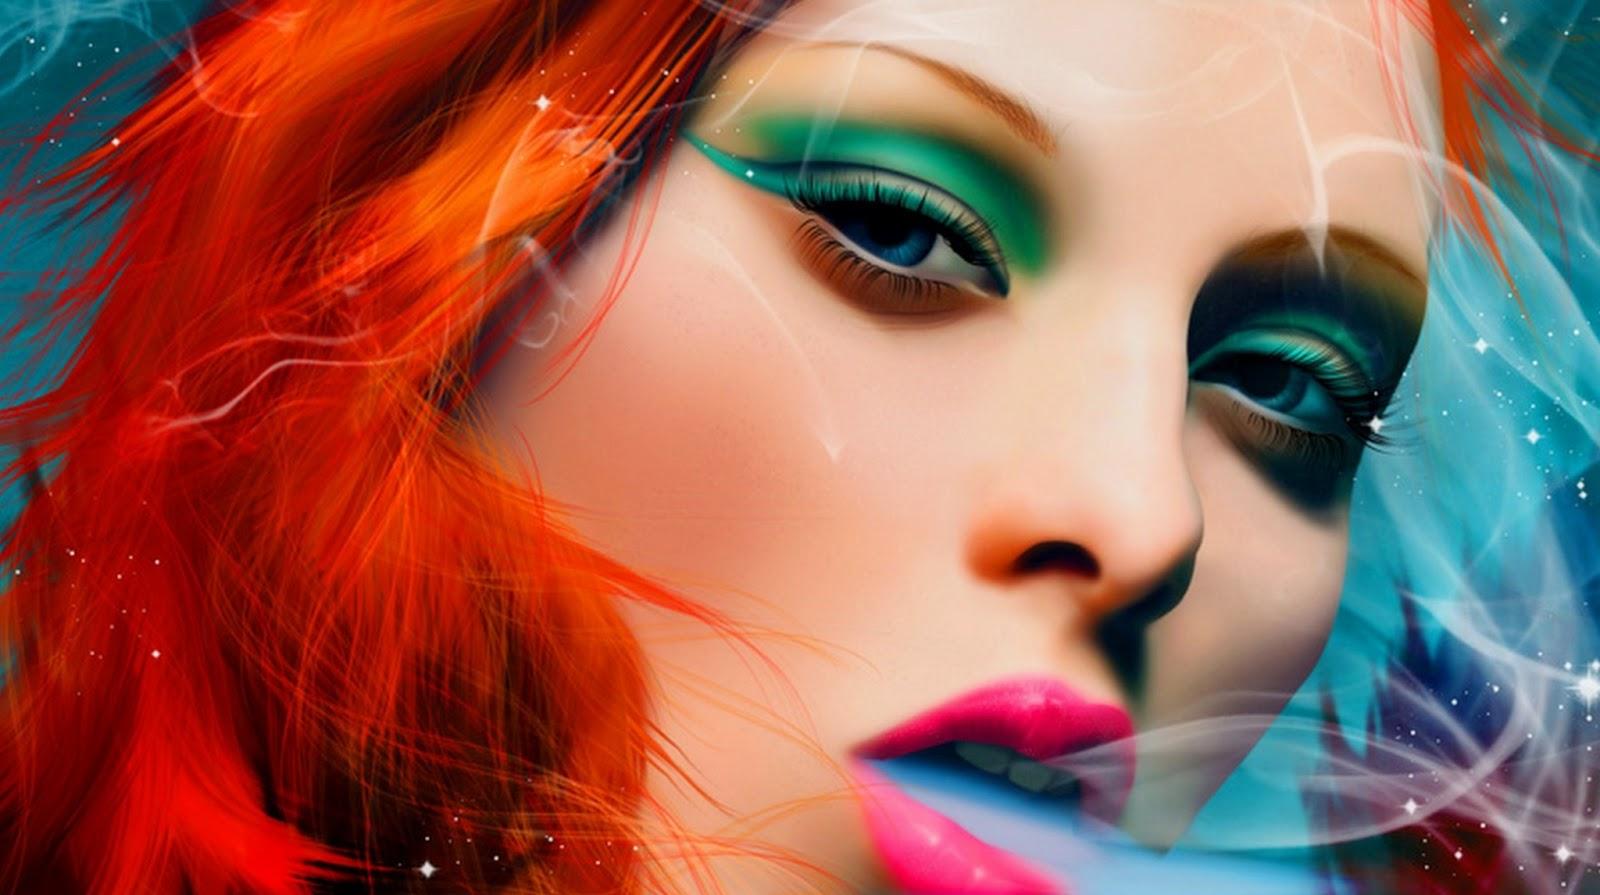 Mujeres Pinturas Realistas Al Oleo Pintora Alice Newberry